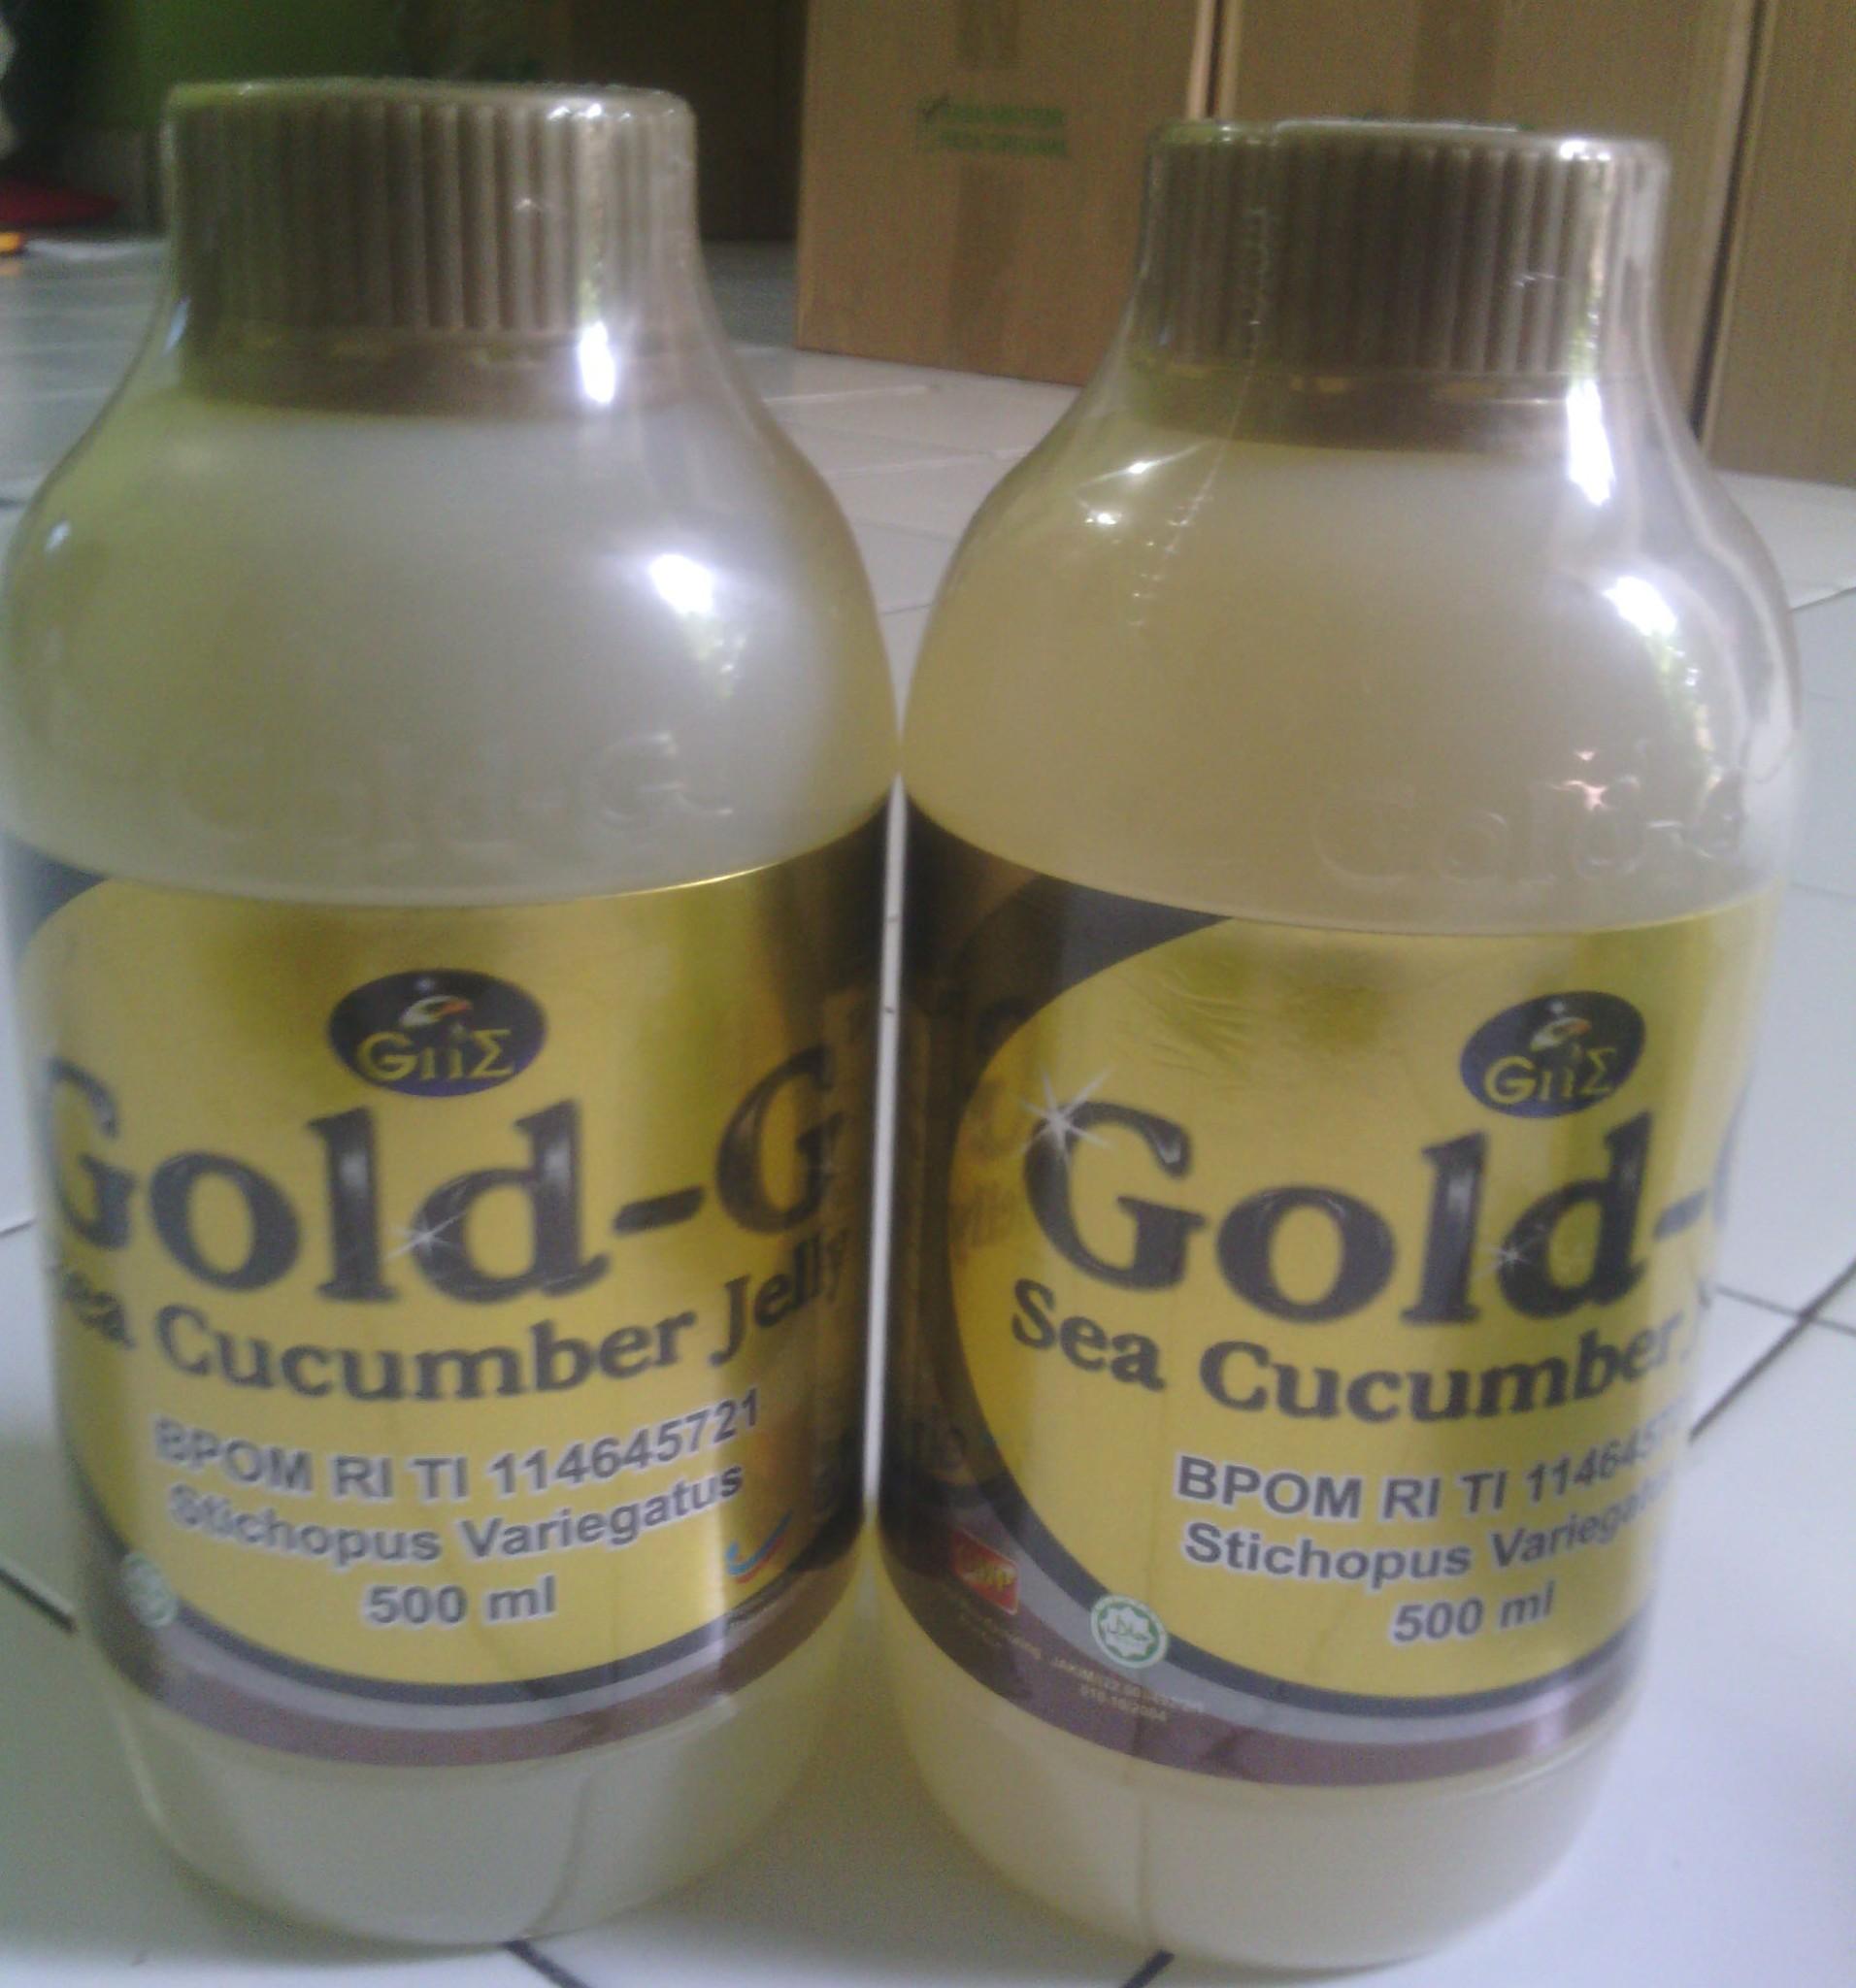 Jual Jelly Gamat Gold G 500ml, Obat Herbal Gamat, Obat Asam Urat - Hilda Jelly Gamat | Tokopedia